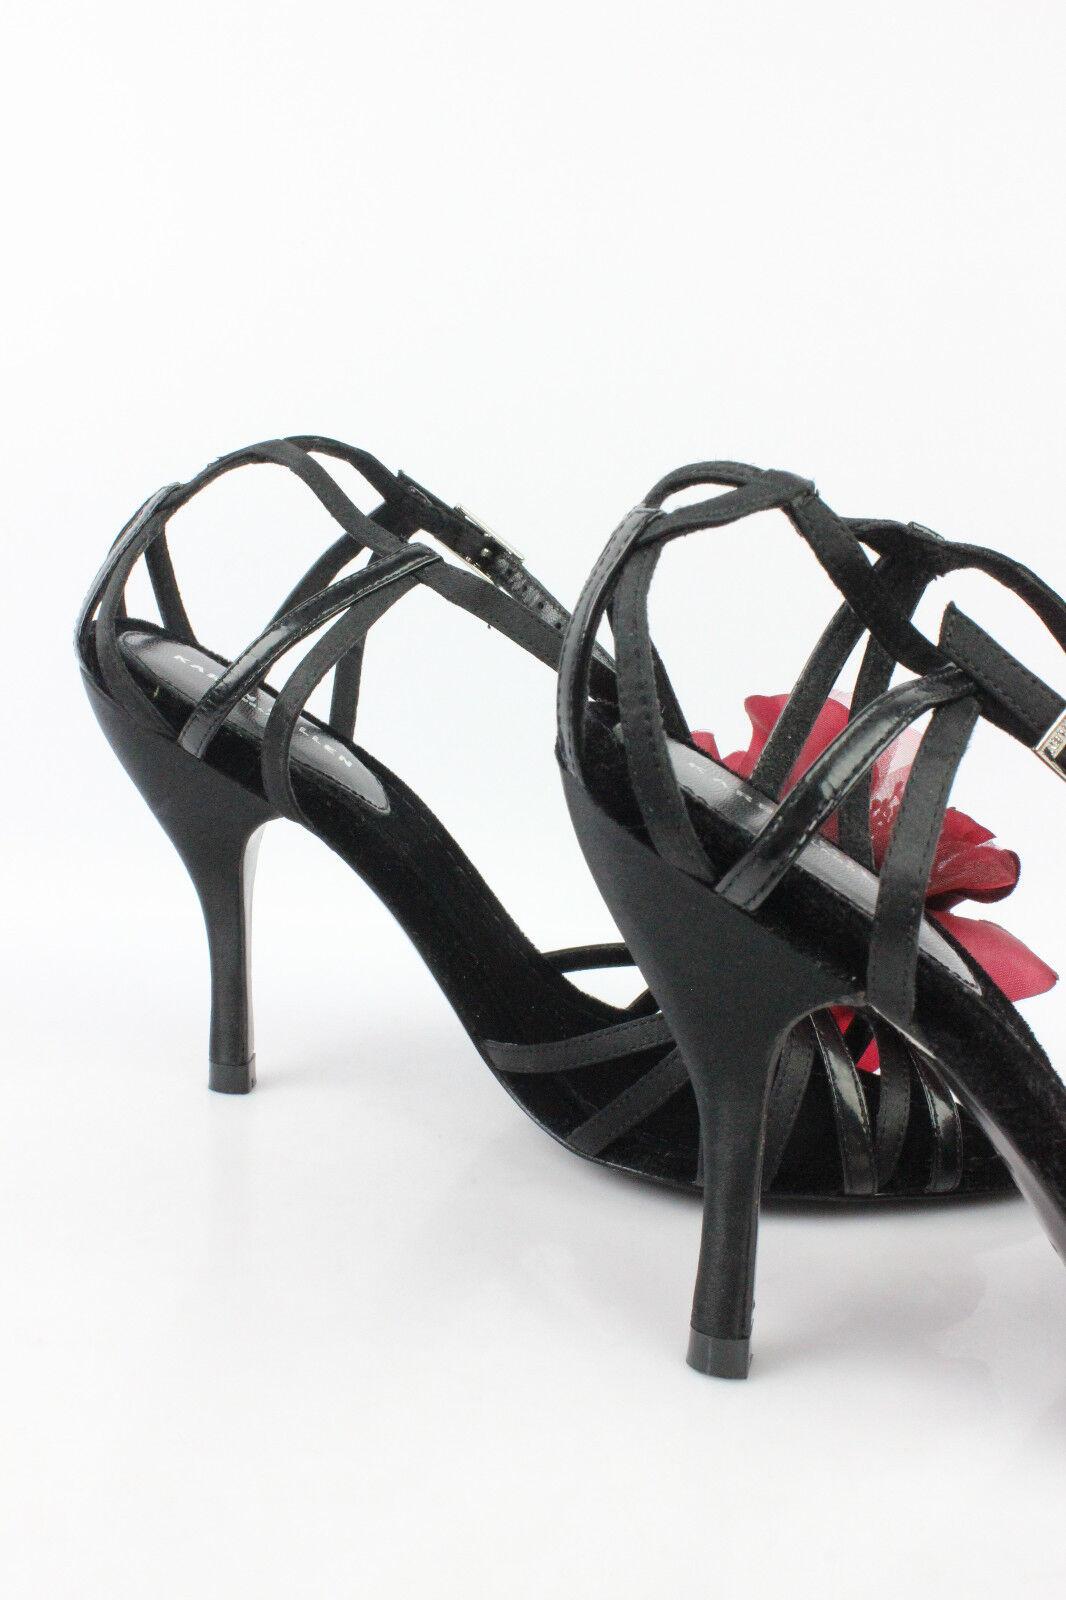 Sandalen Schuhe KAREN MILLEN Vollleder schwarz Blumen Bordeaux top T 37 top Bordeaux Zustand 457e6c